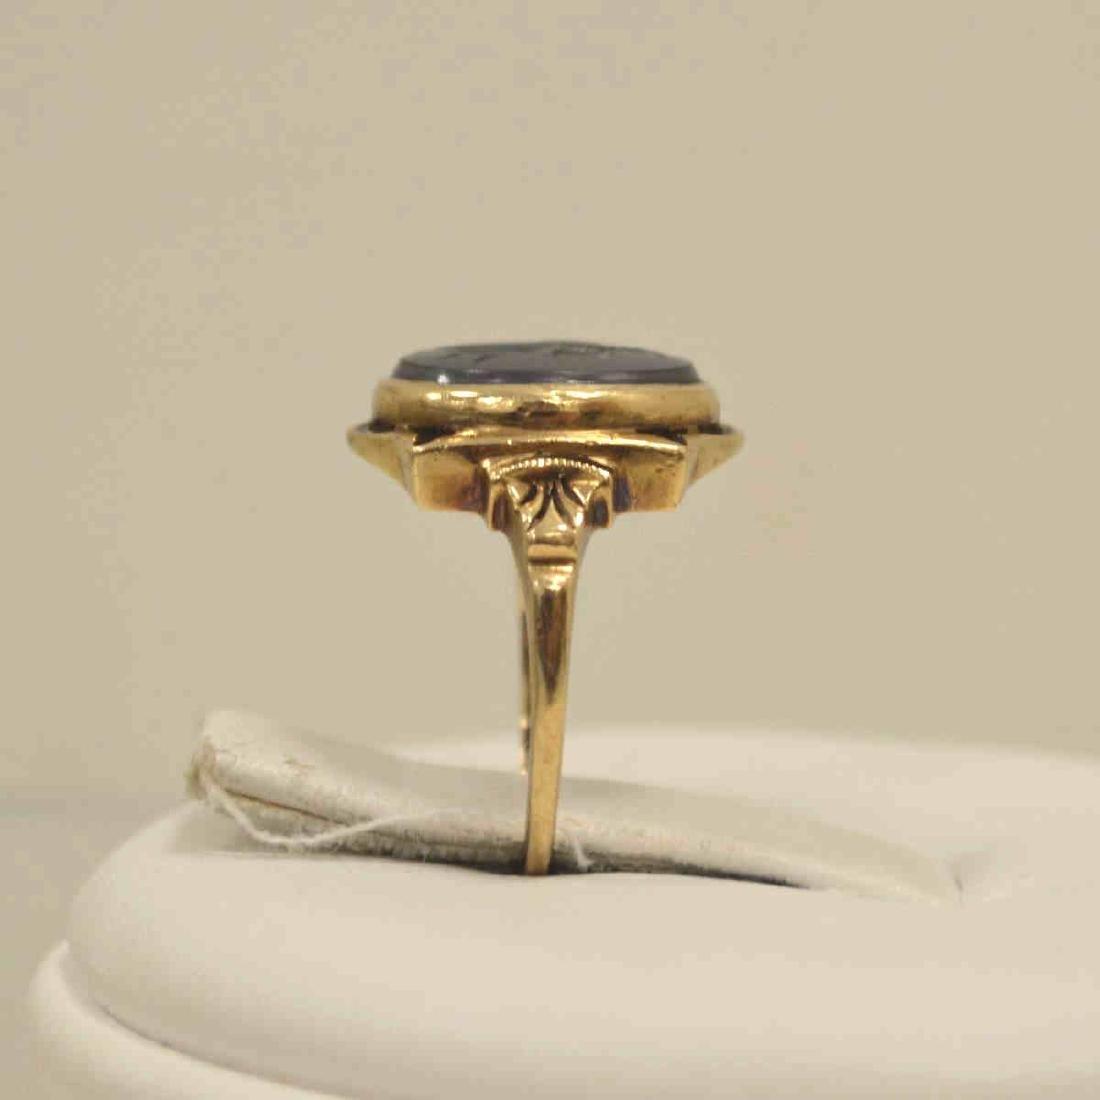 10kt yellow gold hematite intaglio ring - 4